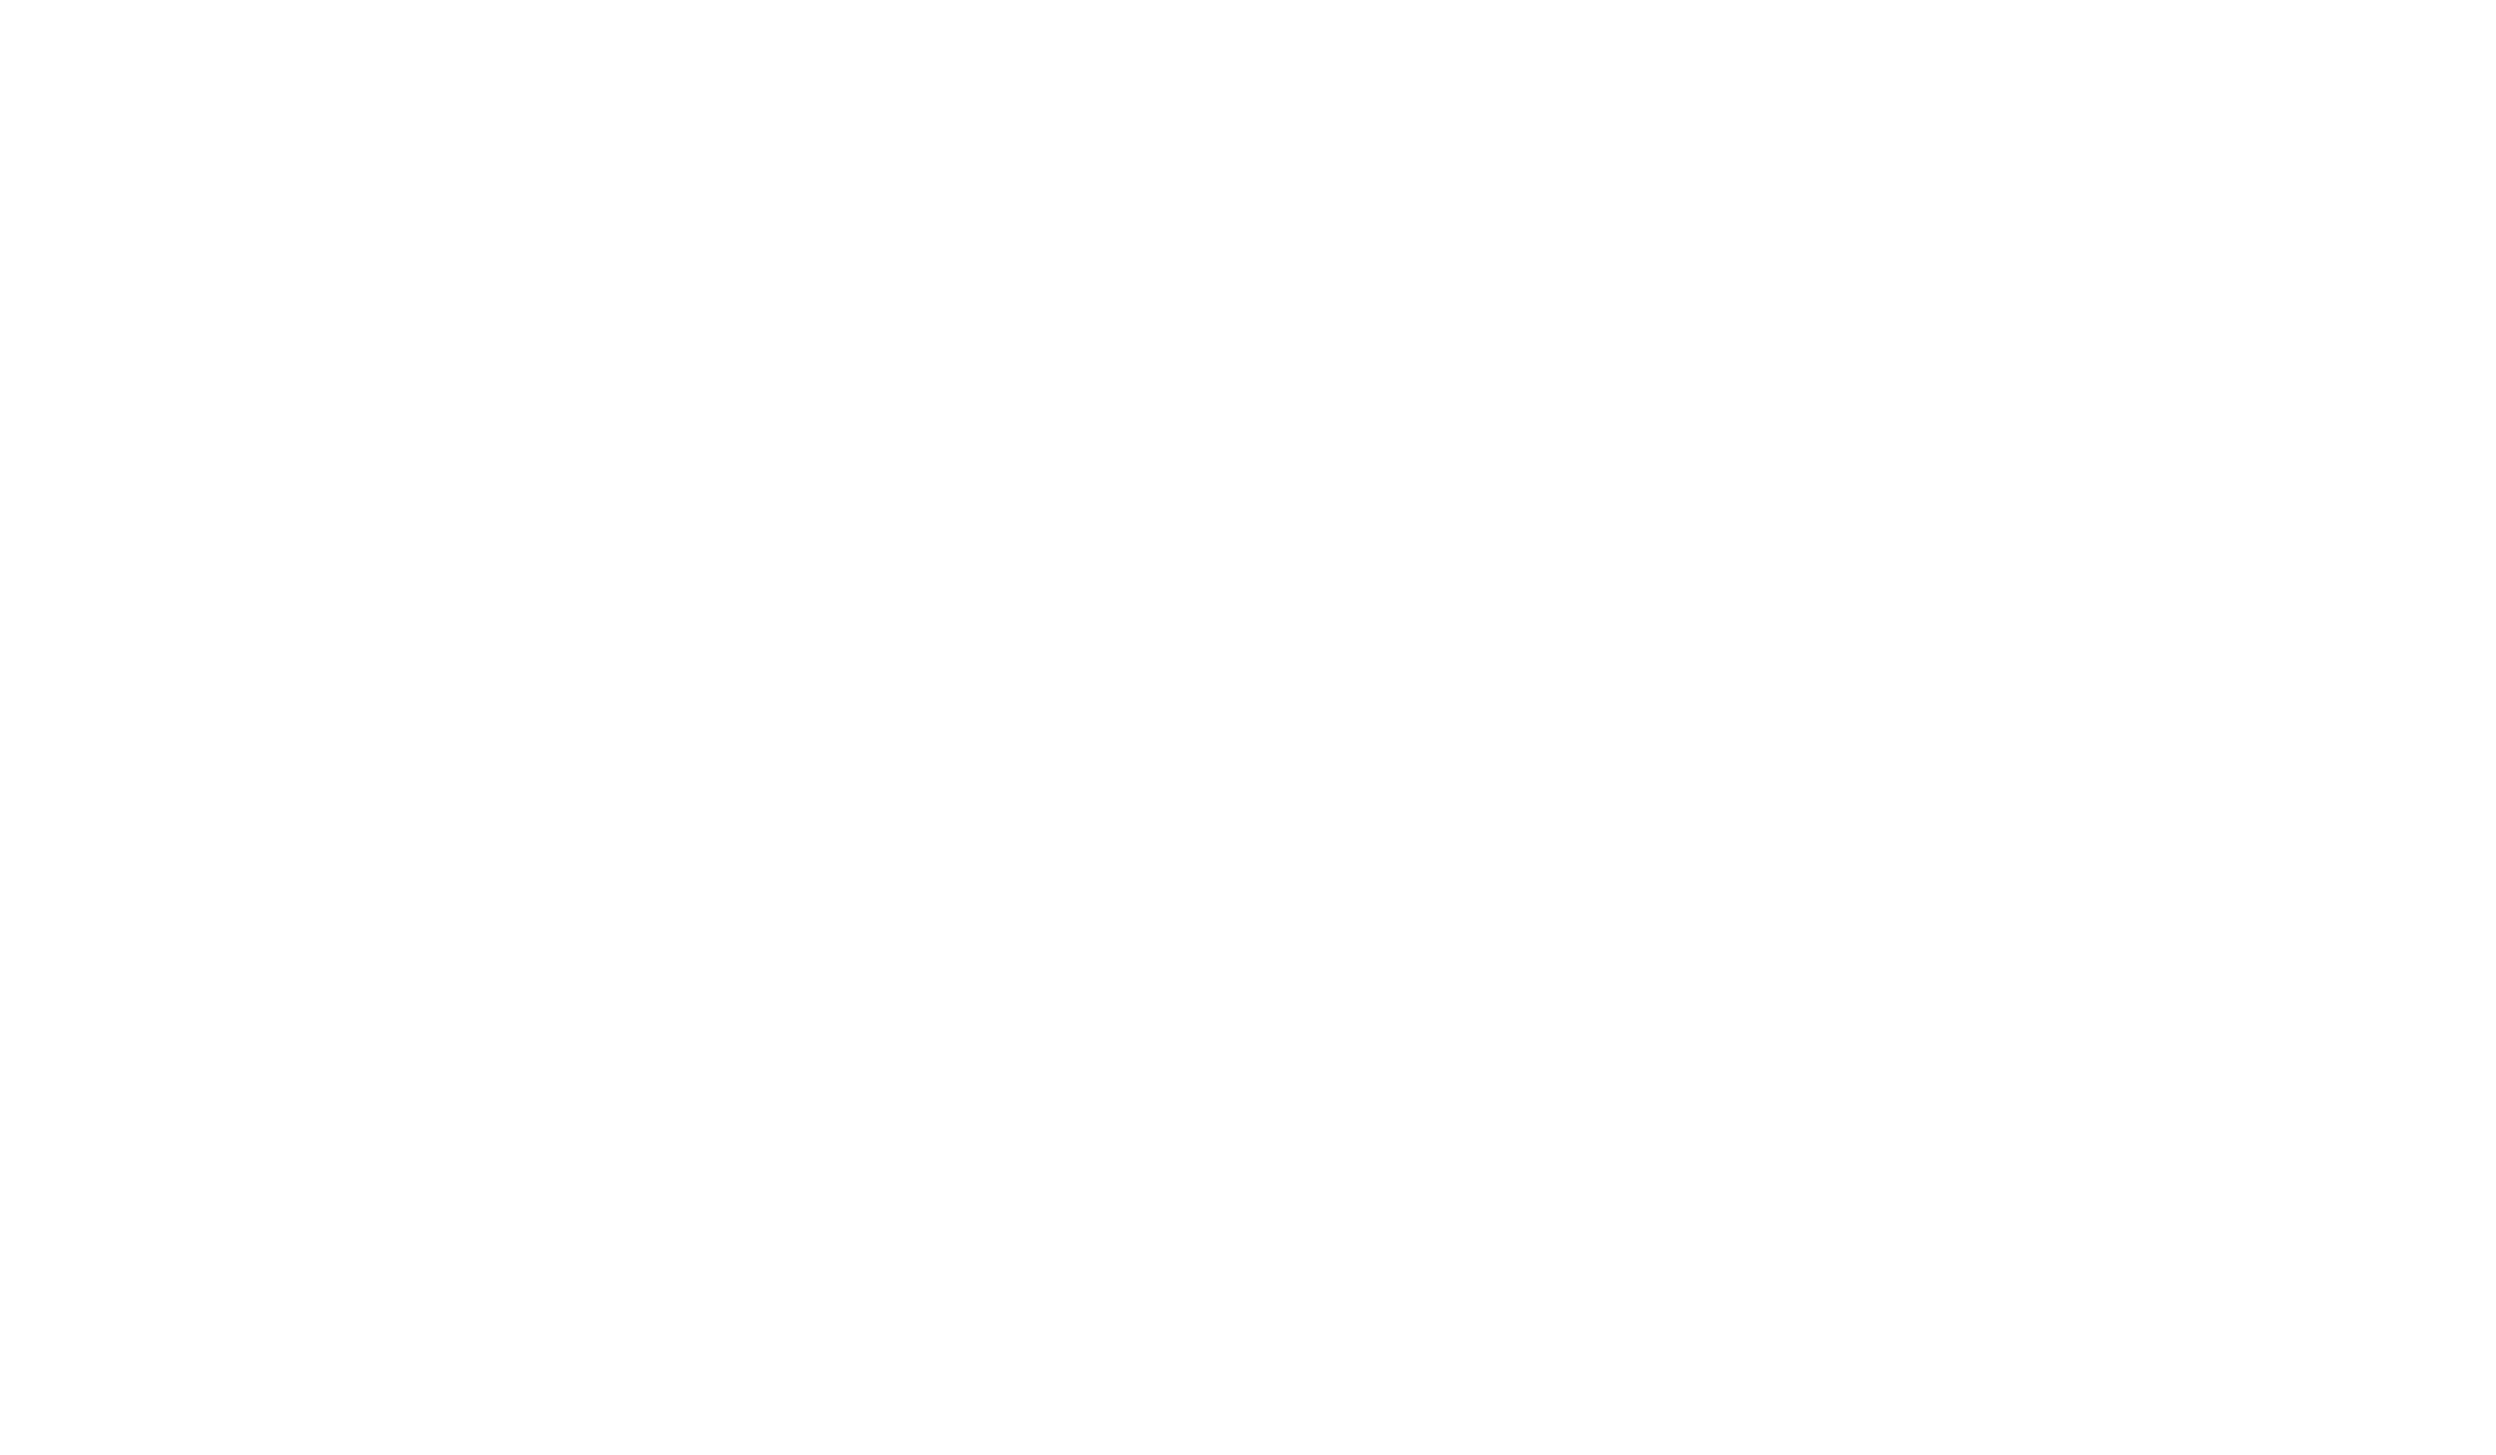 logo kurotel